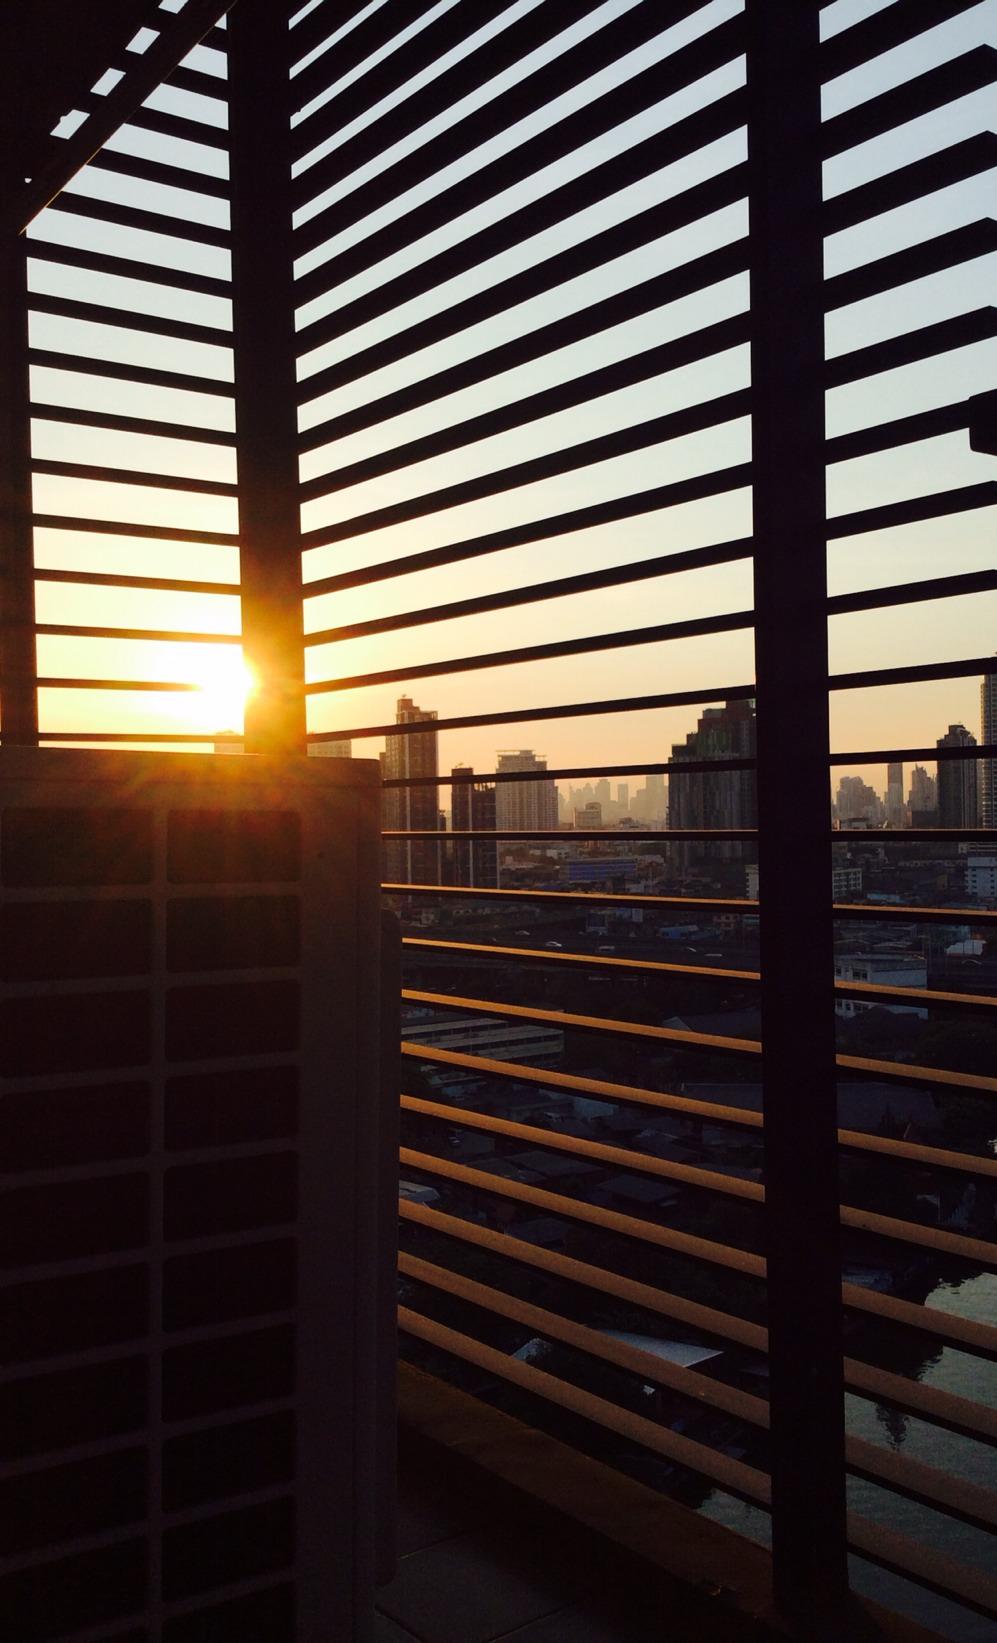 Sunset through silhouette barred-balcony.